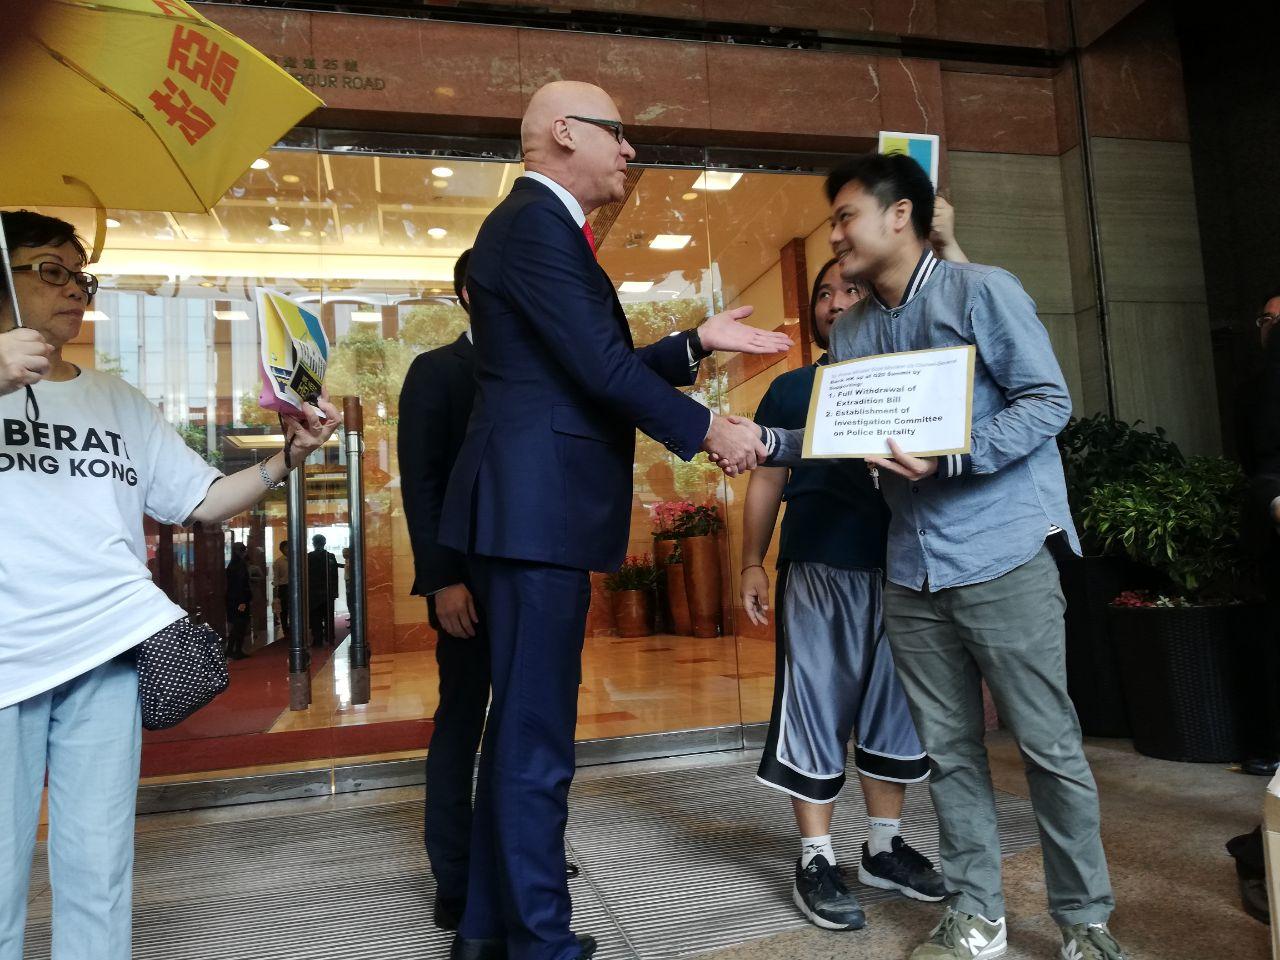 Hong Kong protestors G20 19 Consulates Petition on 26 June 2019